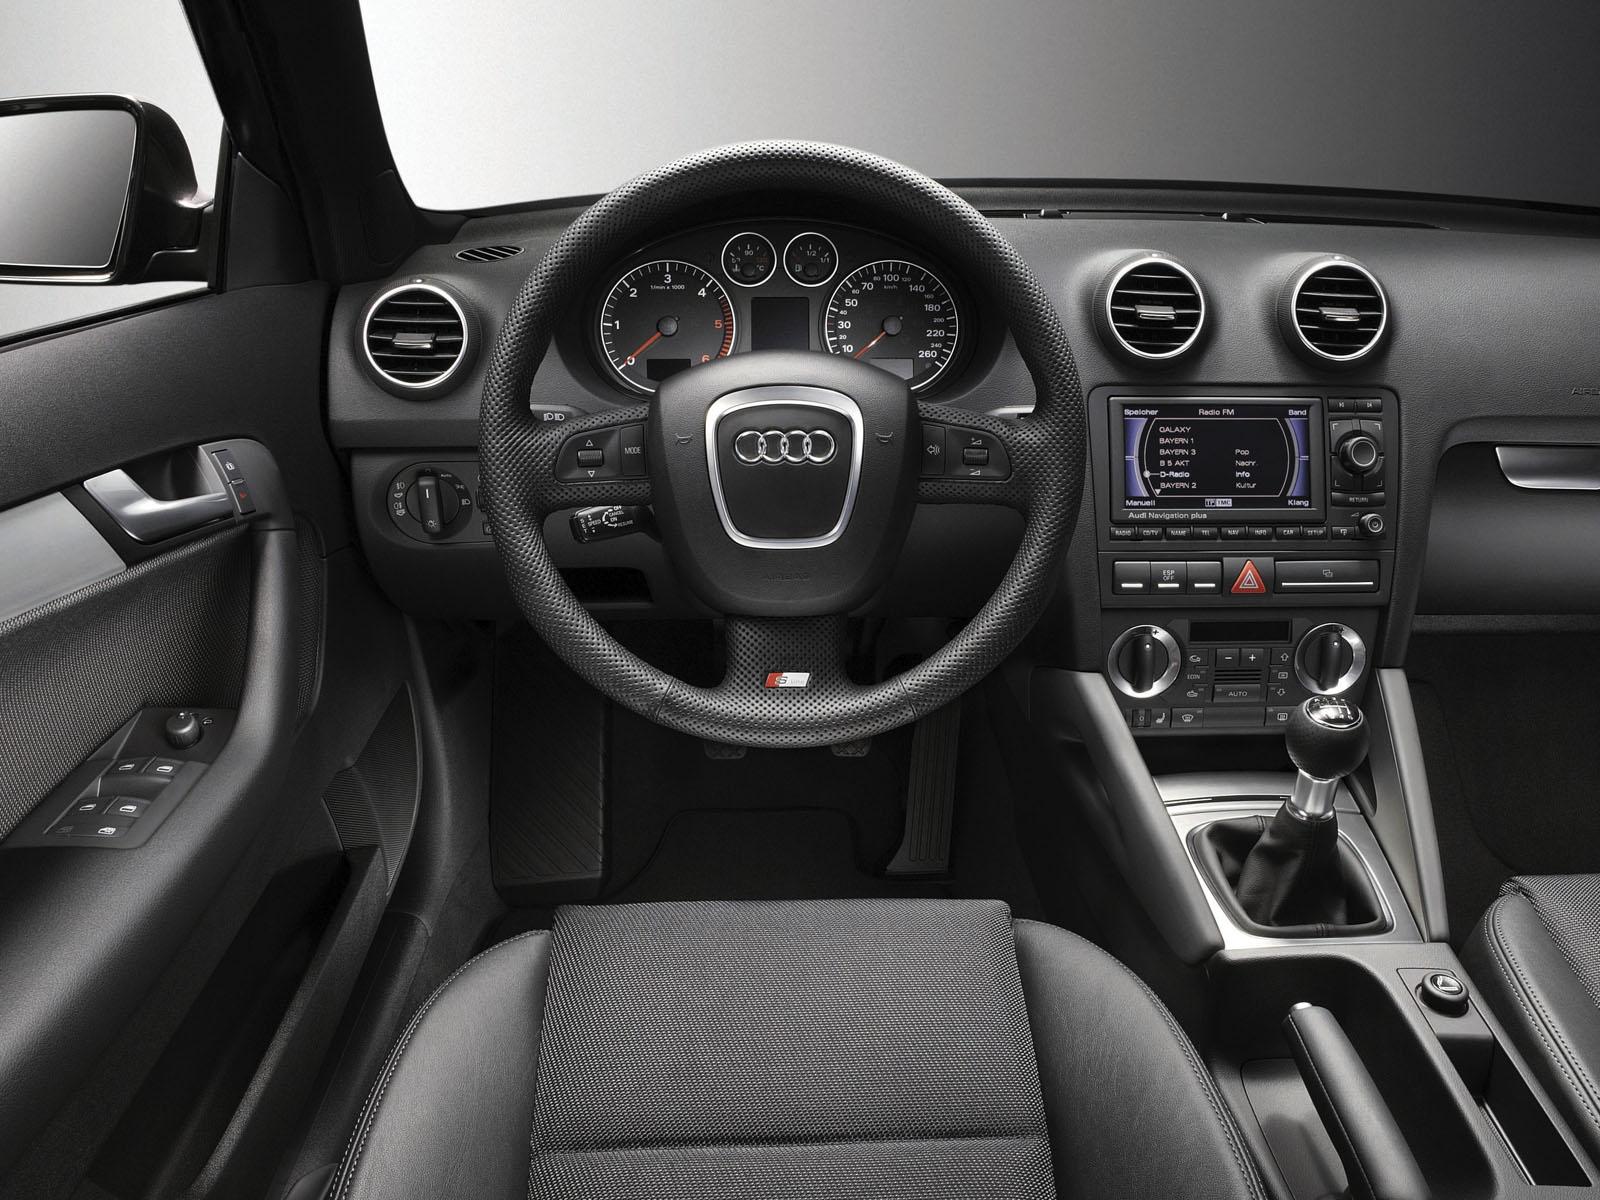 Audi A3 Sportback 2005 Audi A3 Sportback 2005 Photo 17